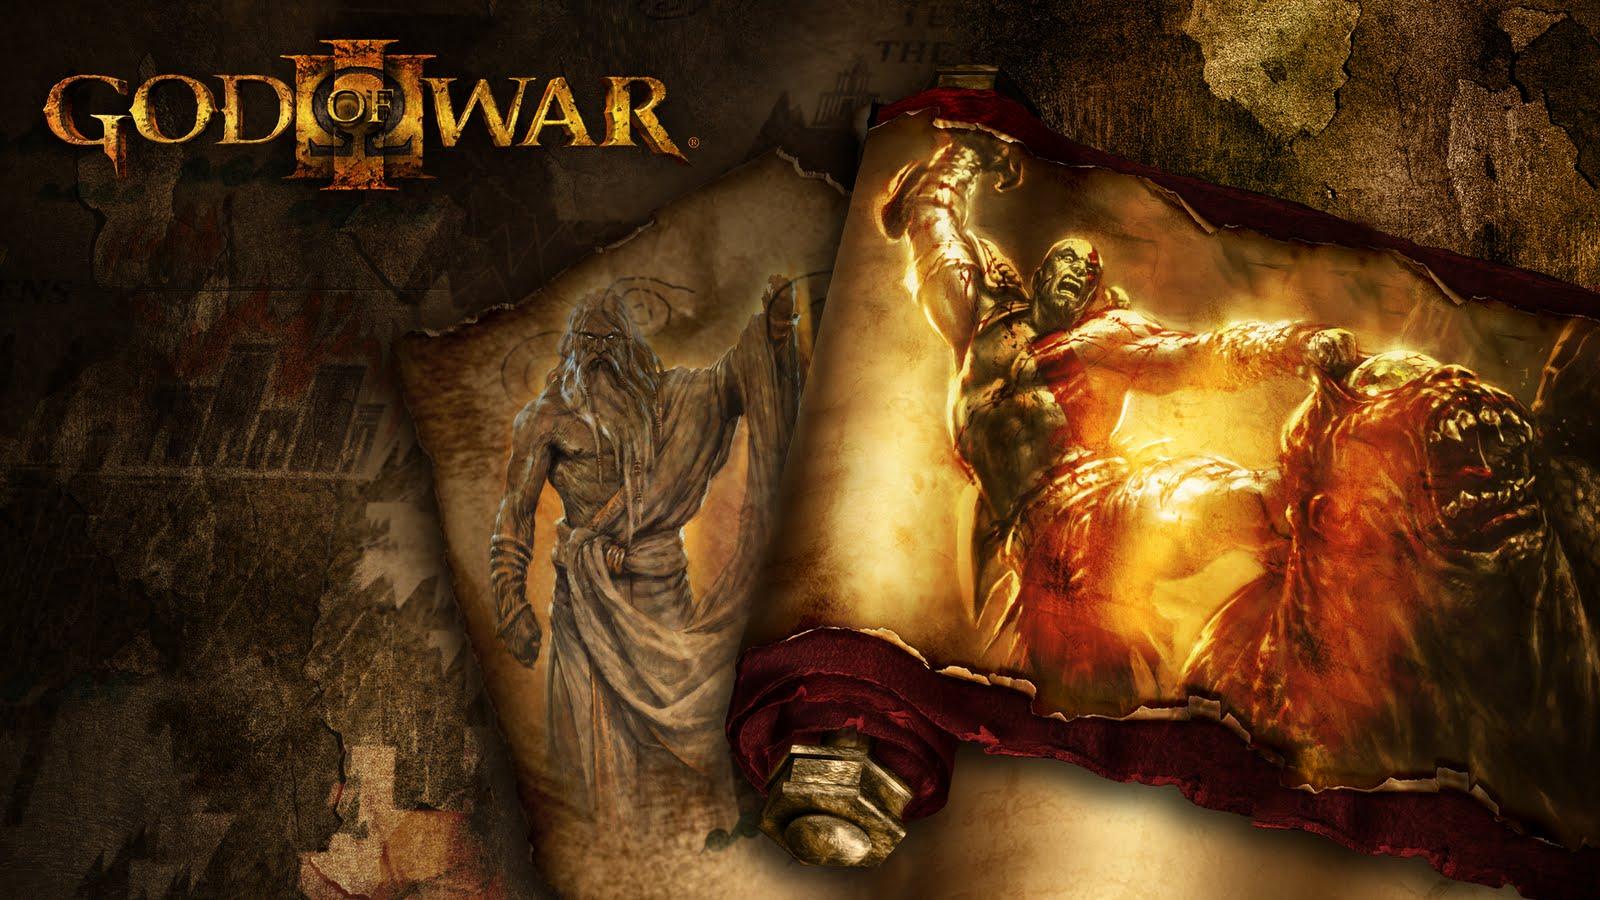 god of war 1 wallpaper hd - photo #15